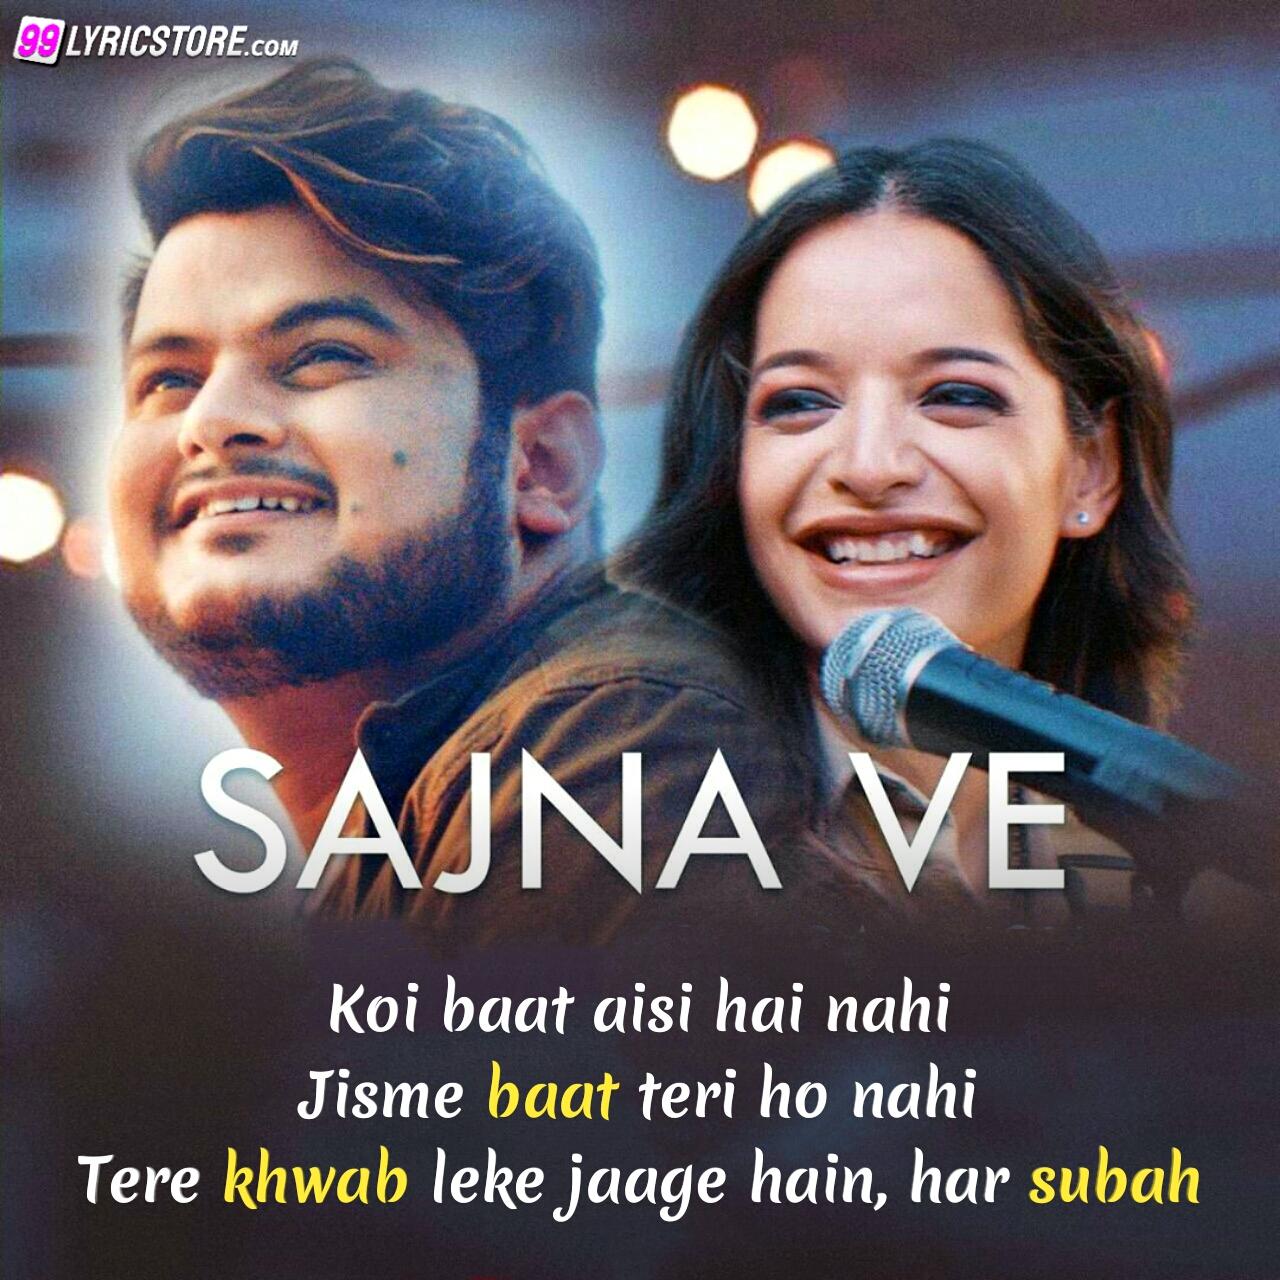 Sajna ve love song sung by Vishal Mishra and Lisa Mishra